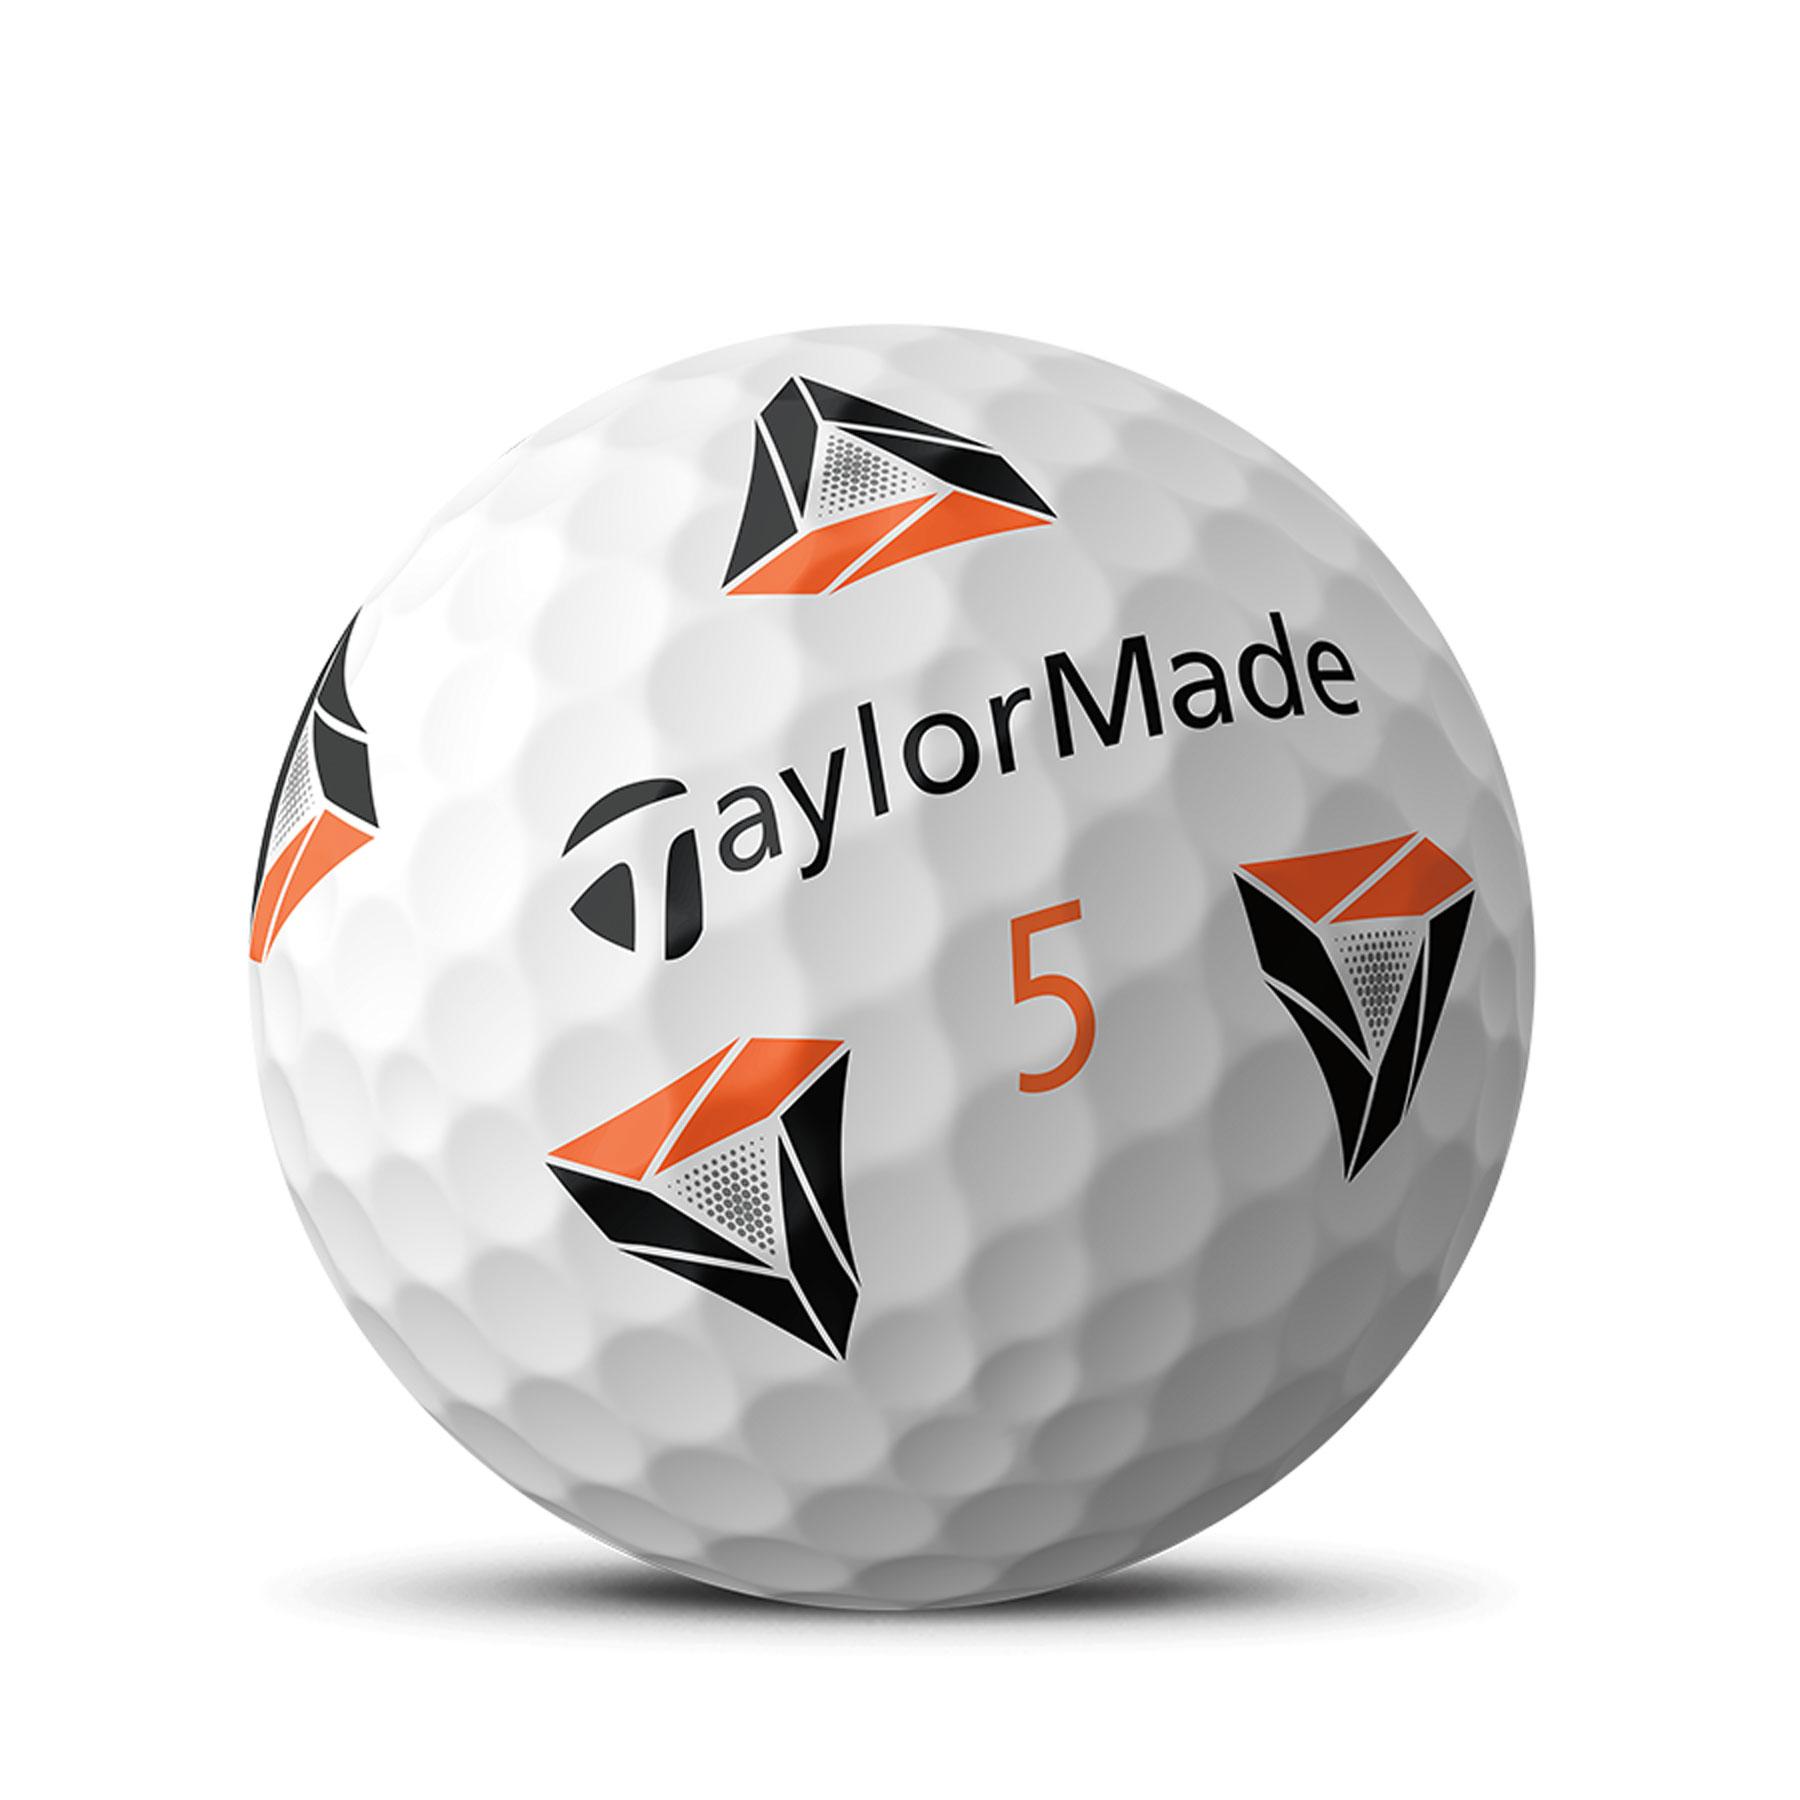 TaylorMade 2020 TP5x PIX Golf Balls